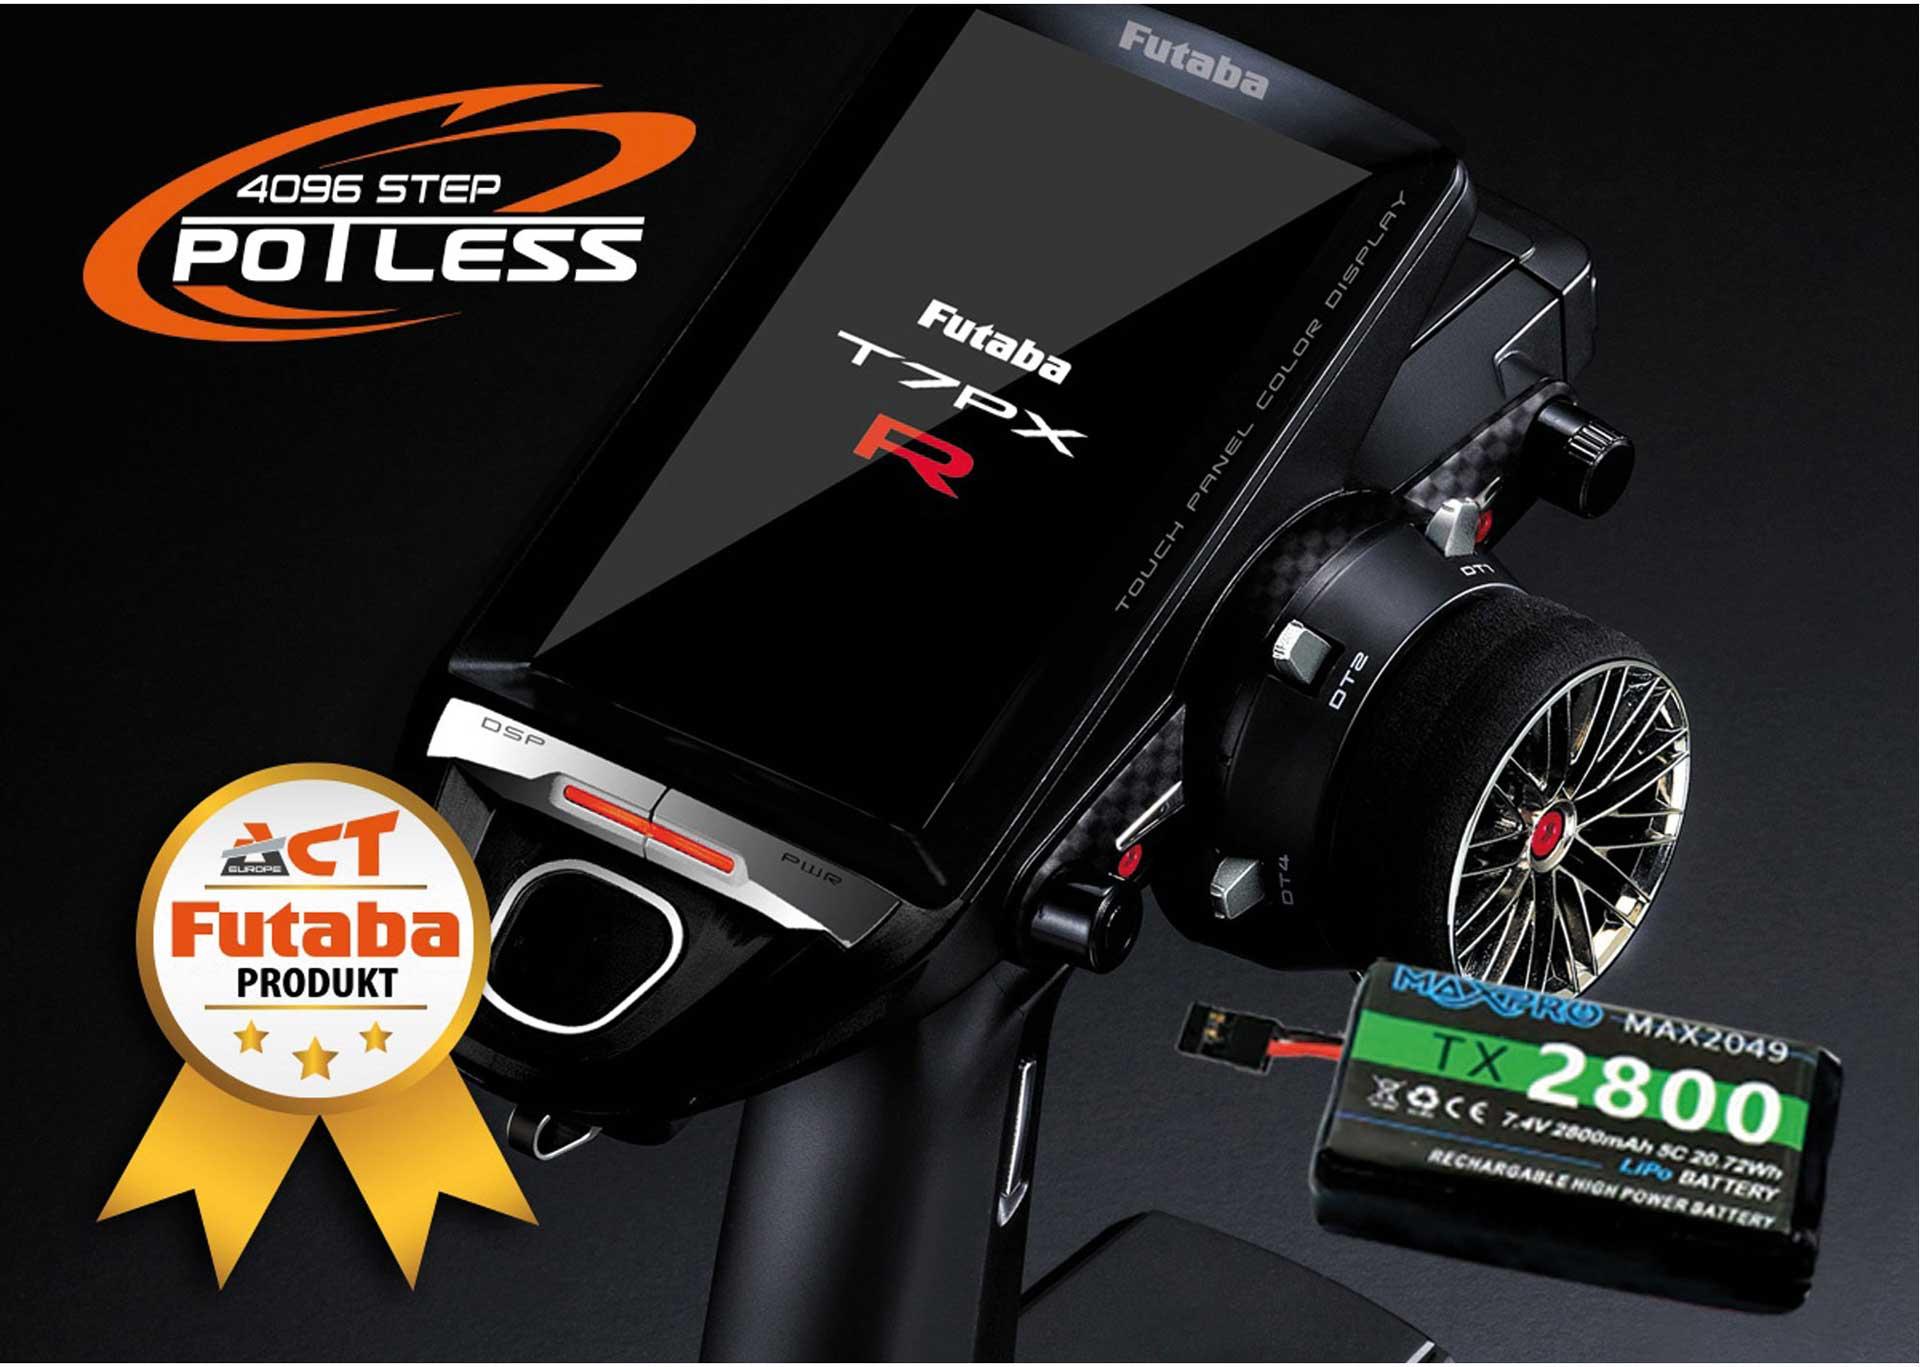 Futaba T7PXR Potless V3 + R334SBS-E + LiPo 2800mAh + Charger